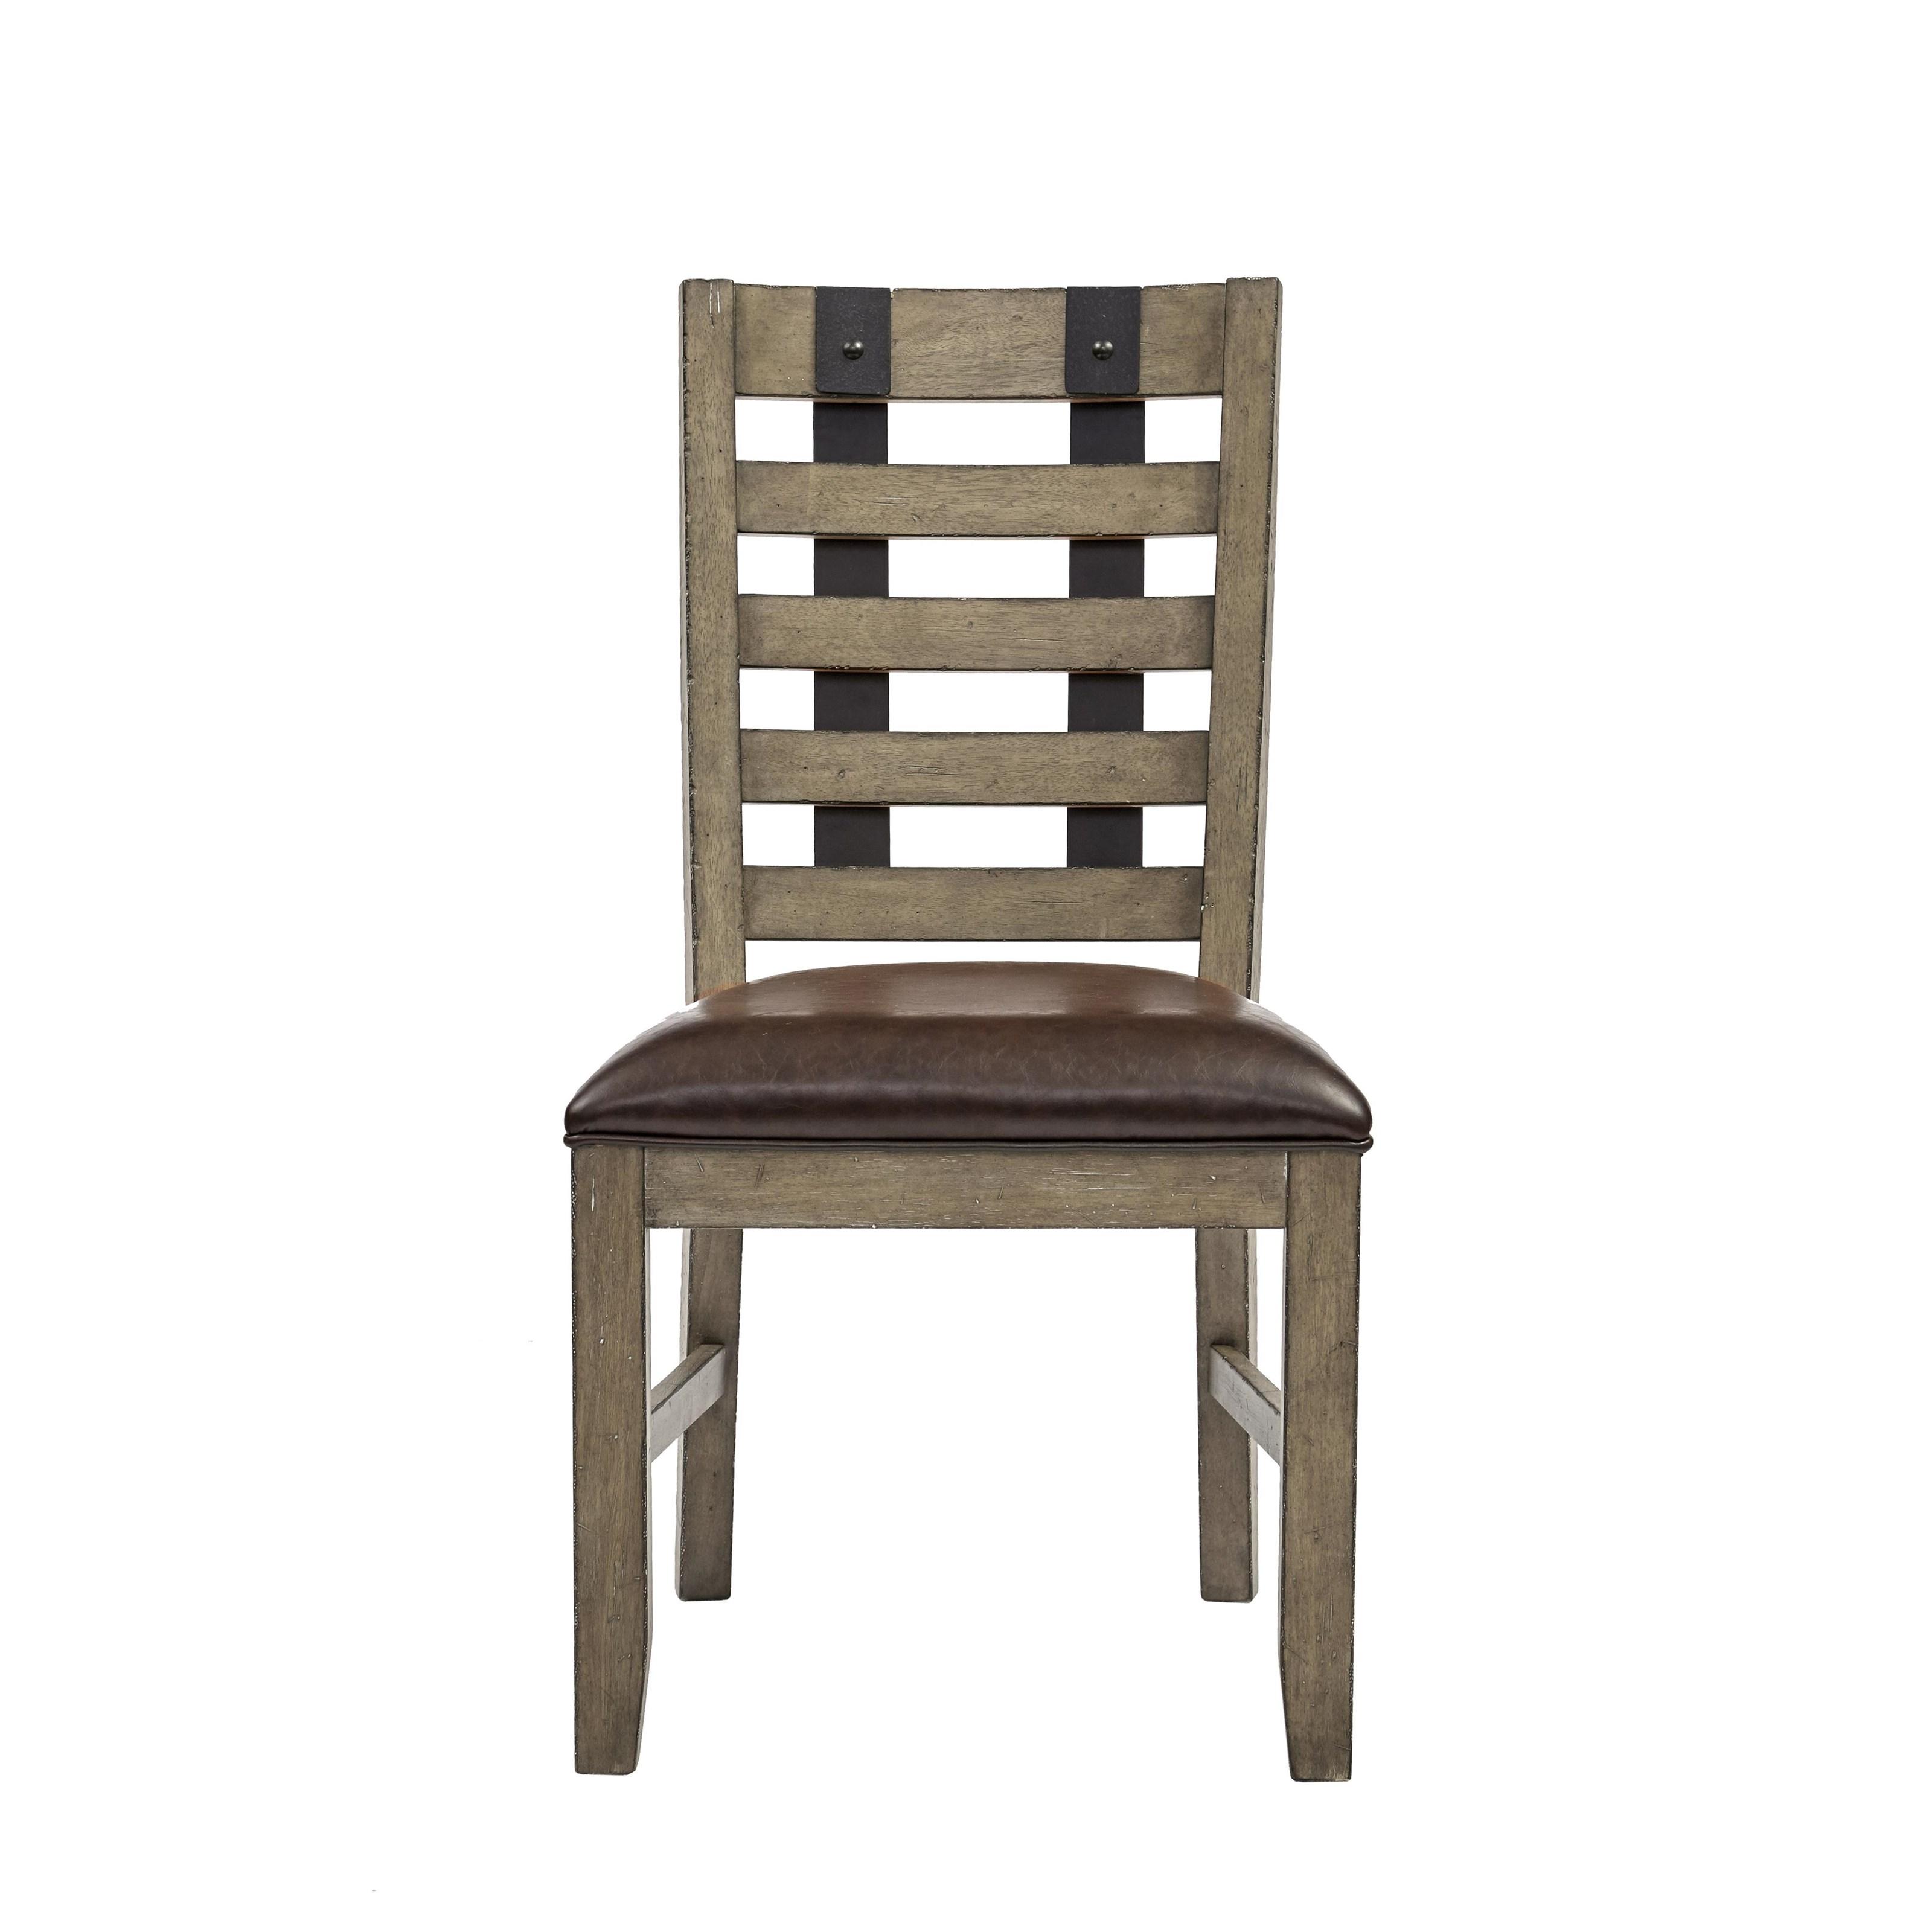 Morris Home Furnishings Oregon District Oregon District Metal Strap Side Chair - Item Number: 605202523